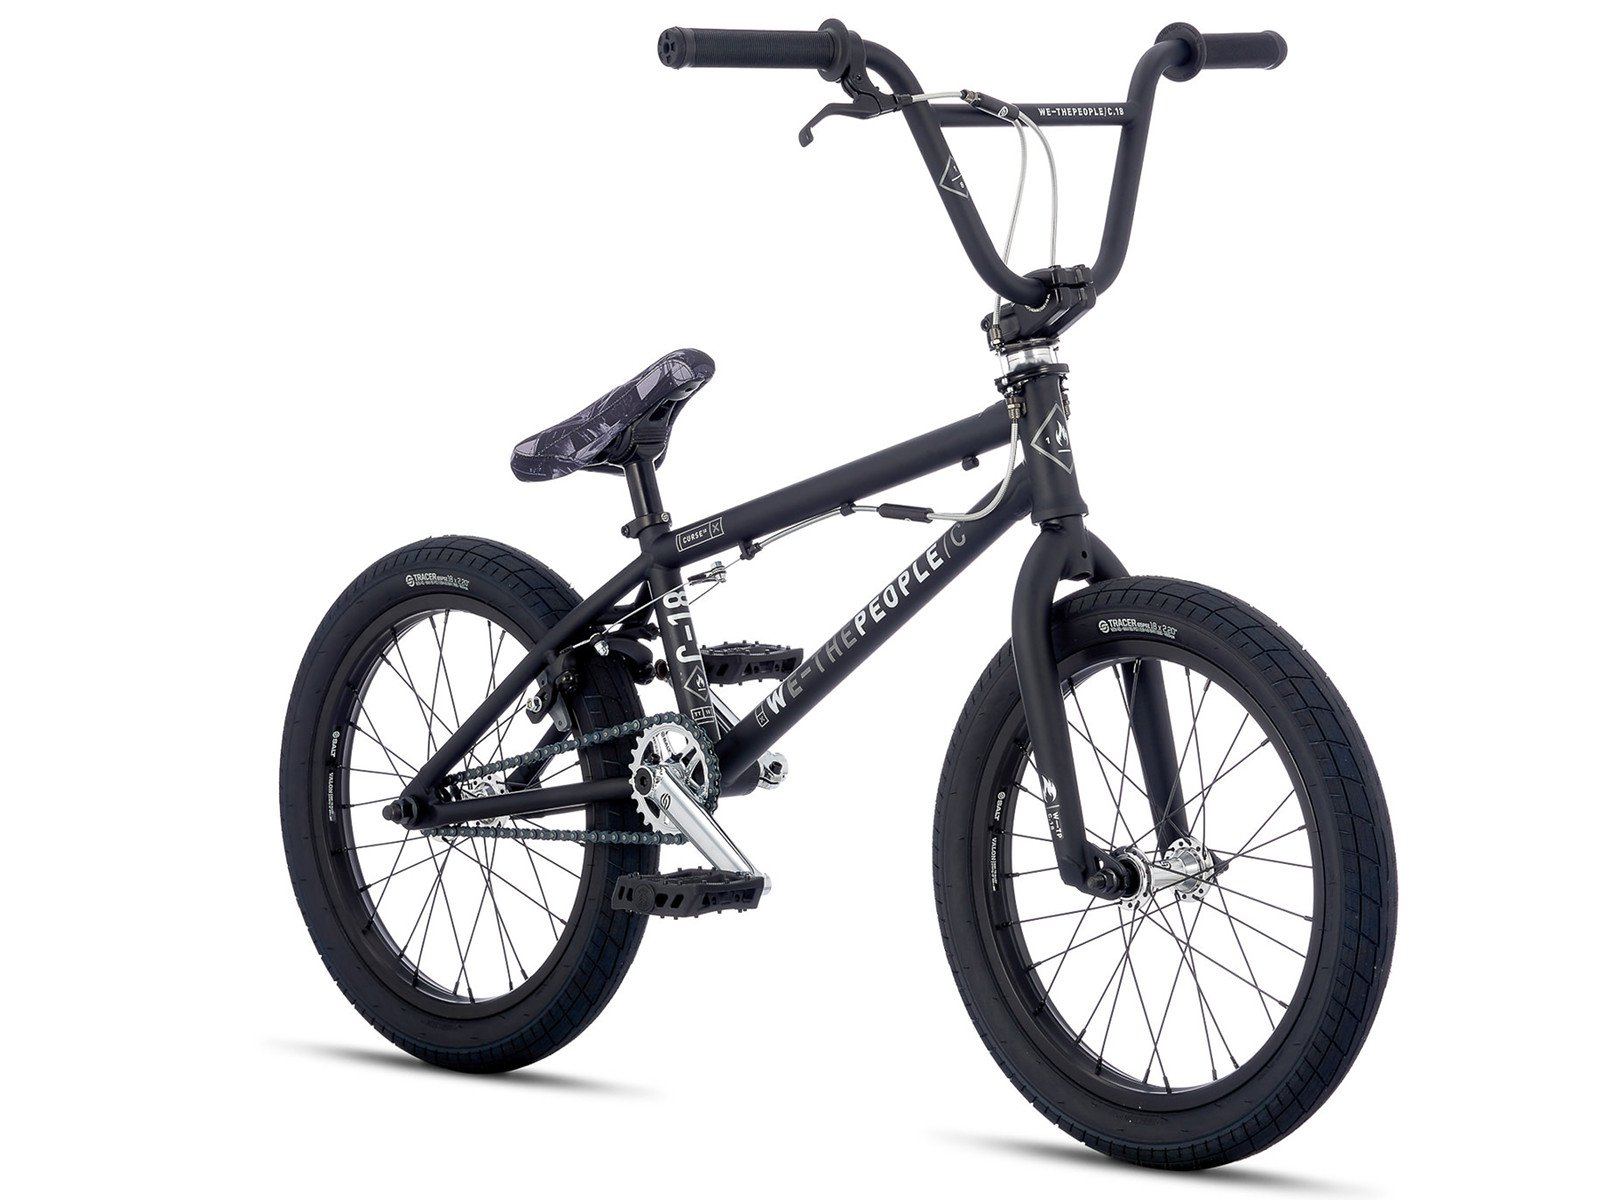 wethepeople curse fs 18 2017 bmx bike 18 inch matt. Black Bedroom Furniture Sets. Home Design Ideas